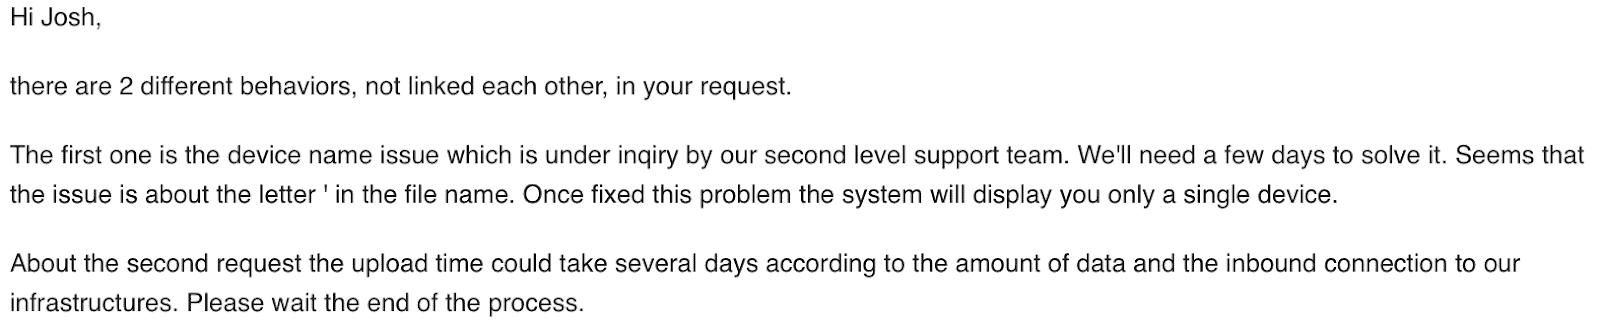 Memopal Support Email Response